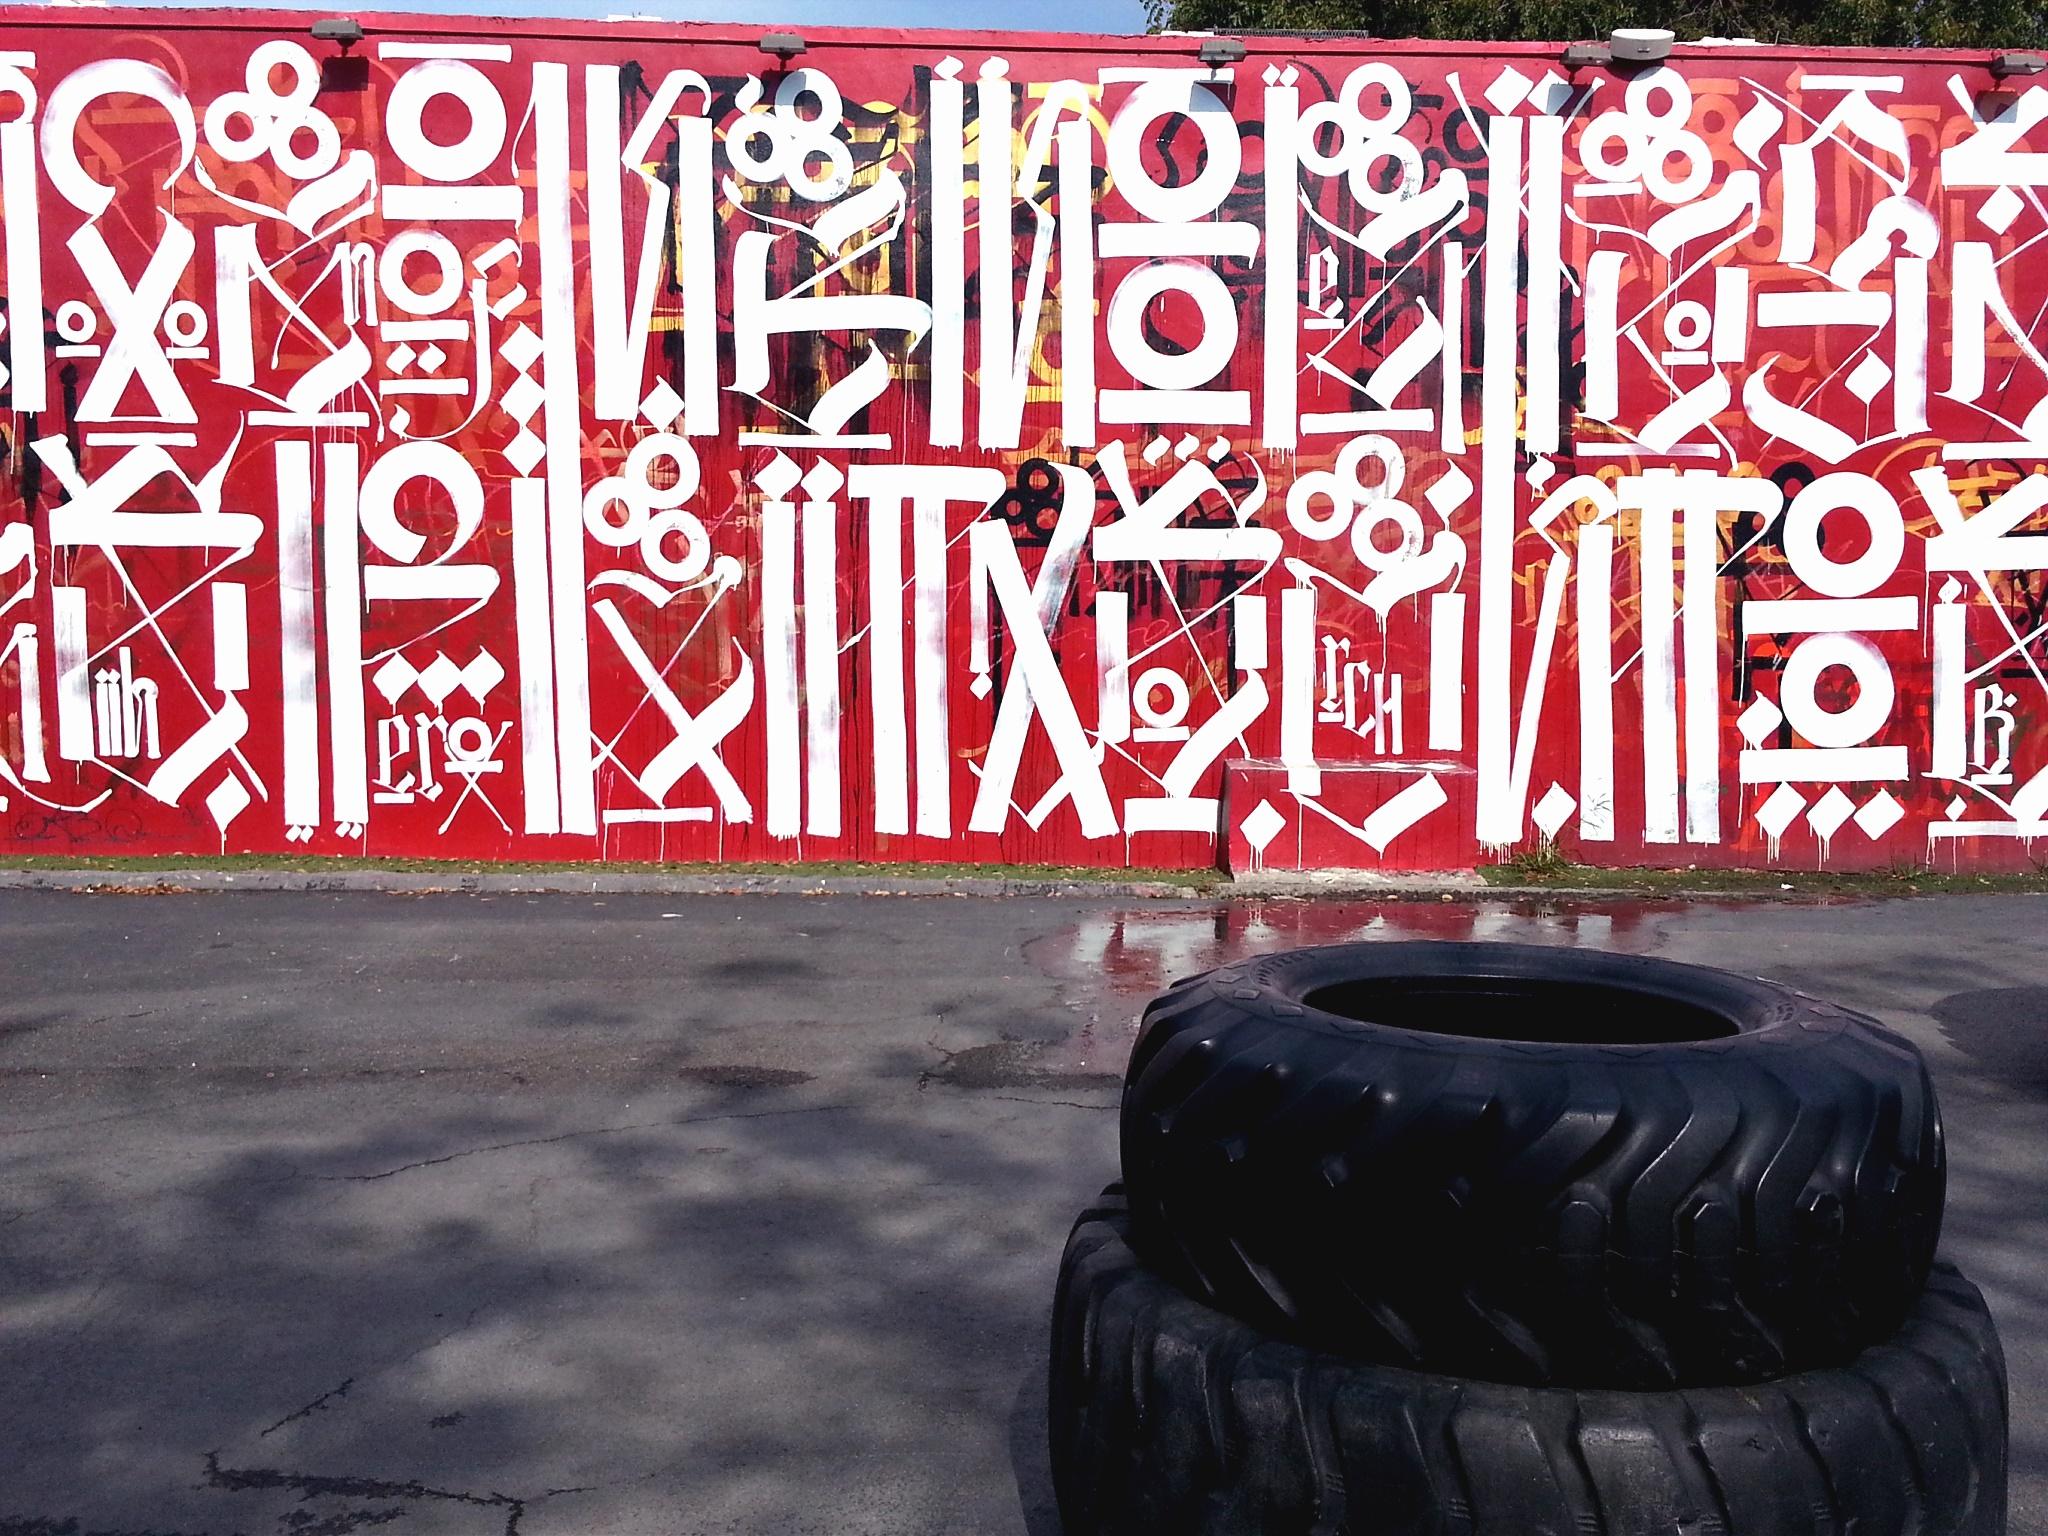 ironey retna street art wynwood